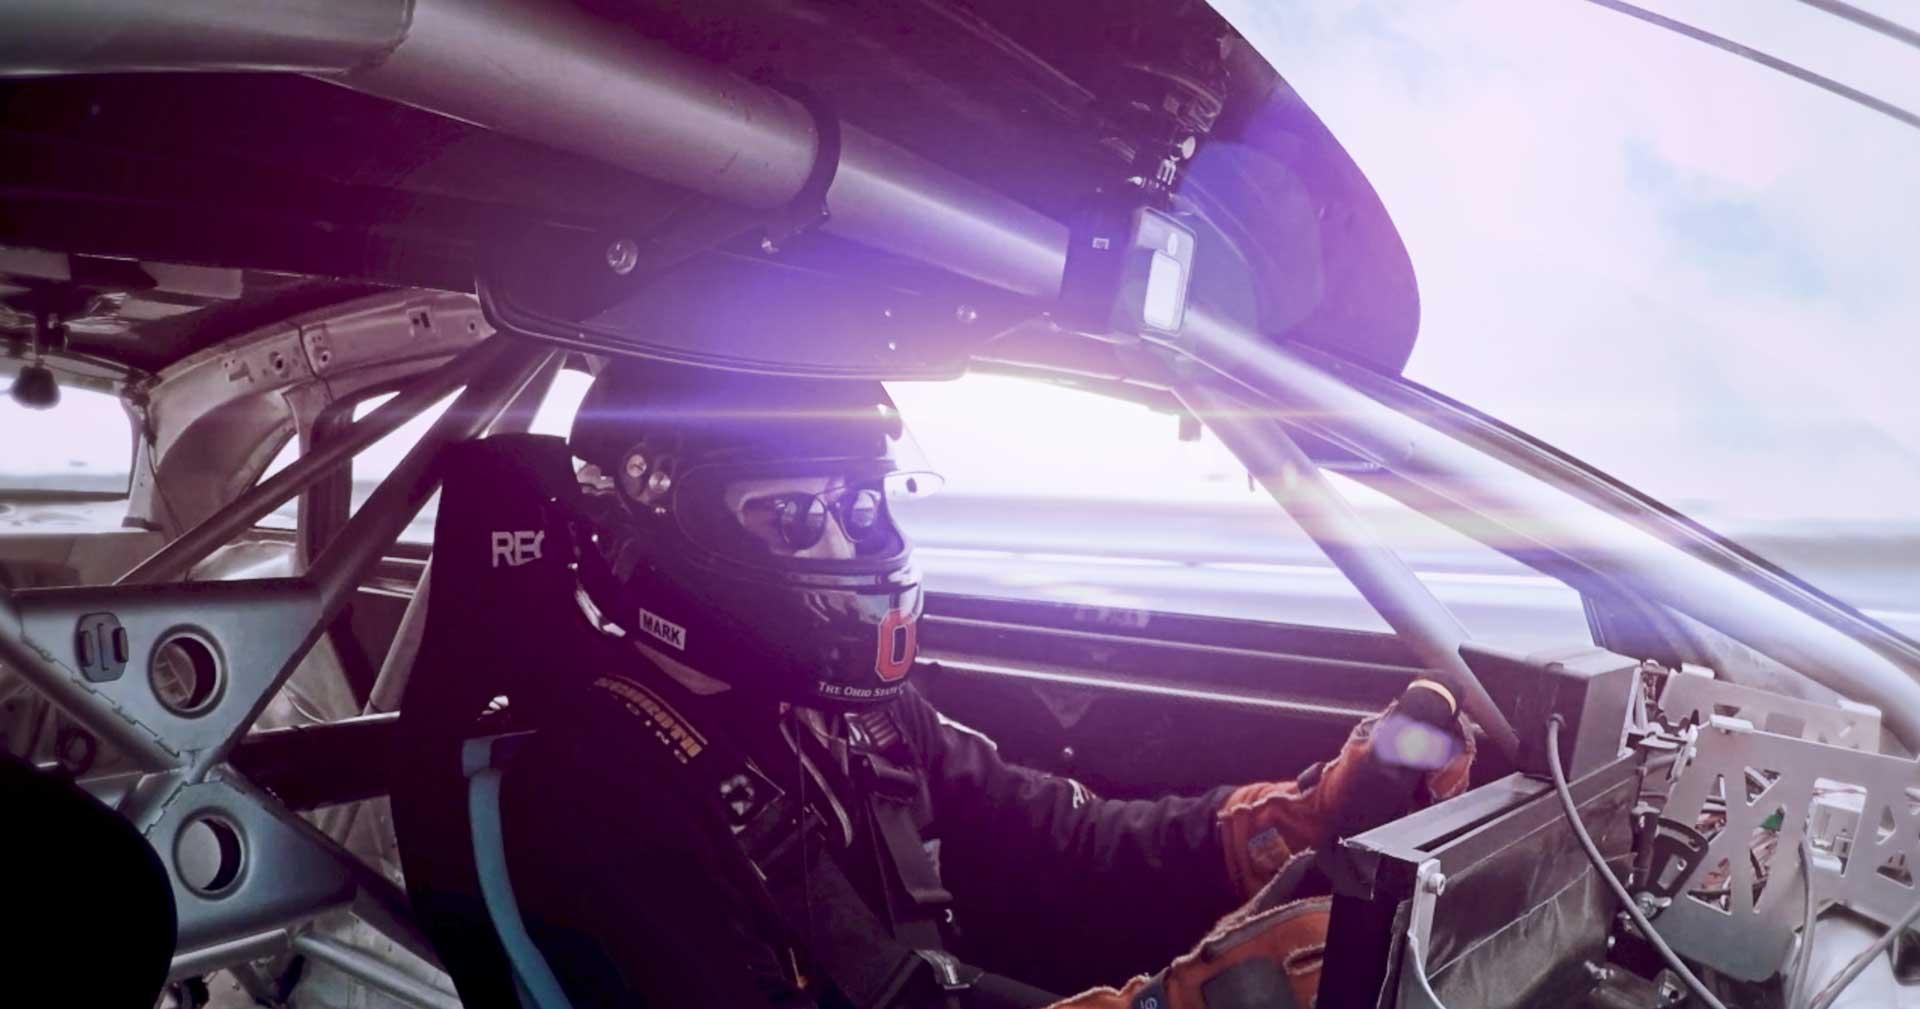 Гонщик внутри кузова Lucid Air Alpha Speed Car